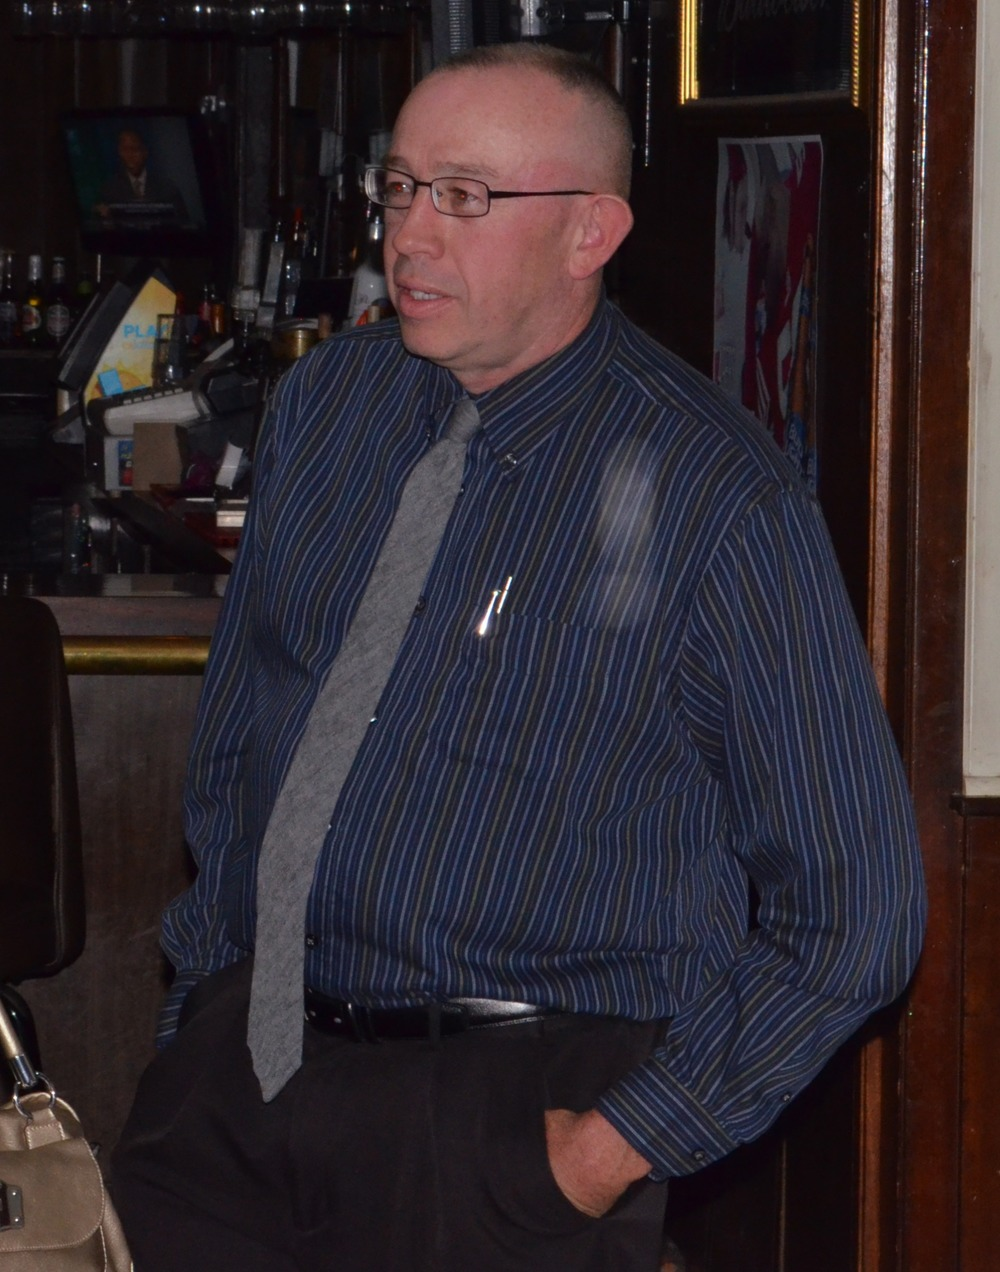 Steve Rychard